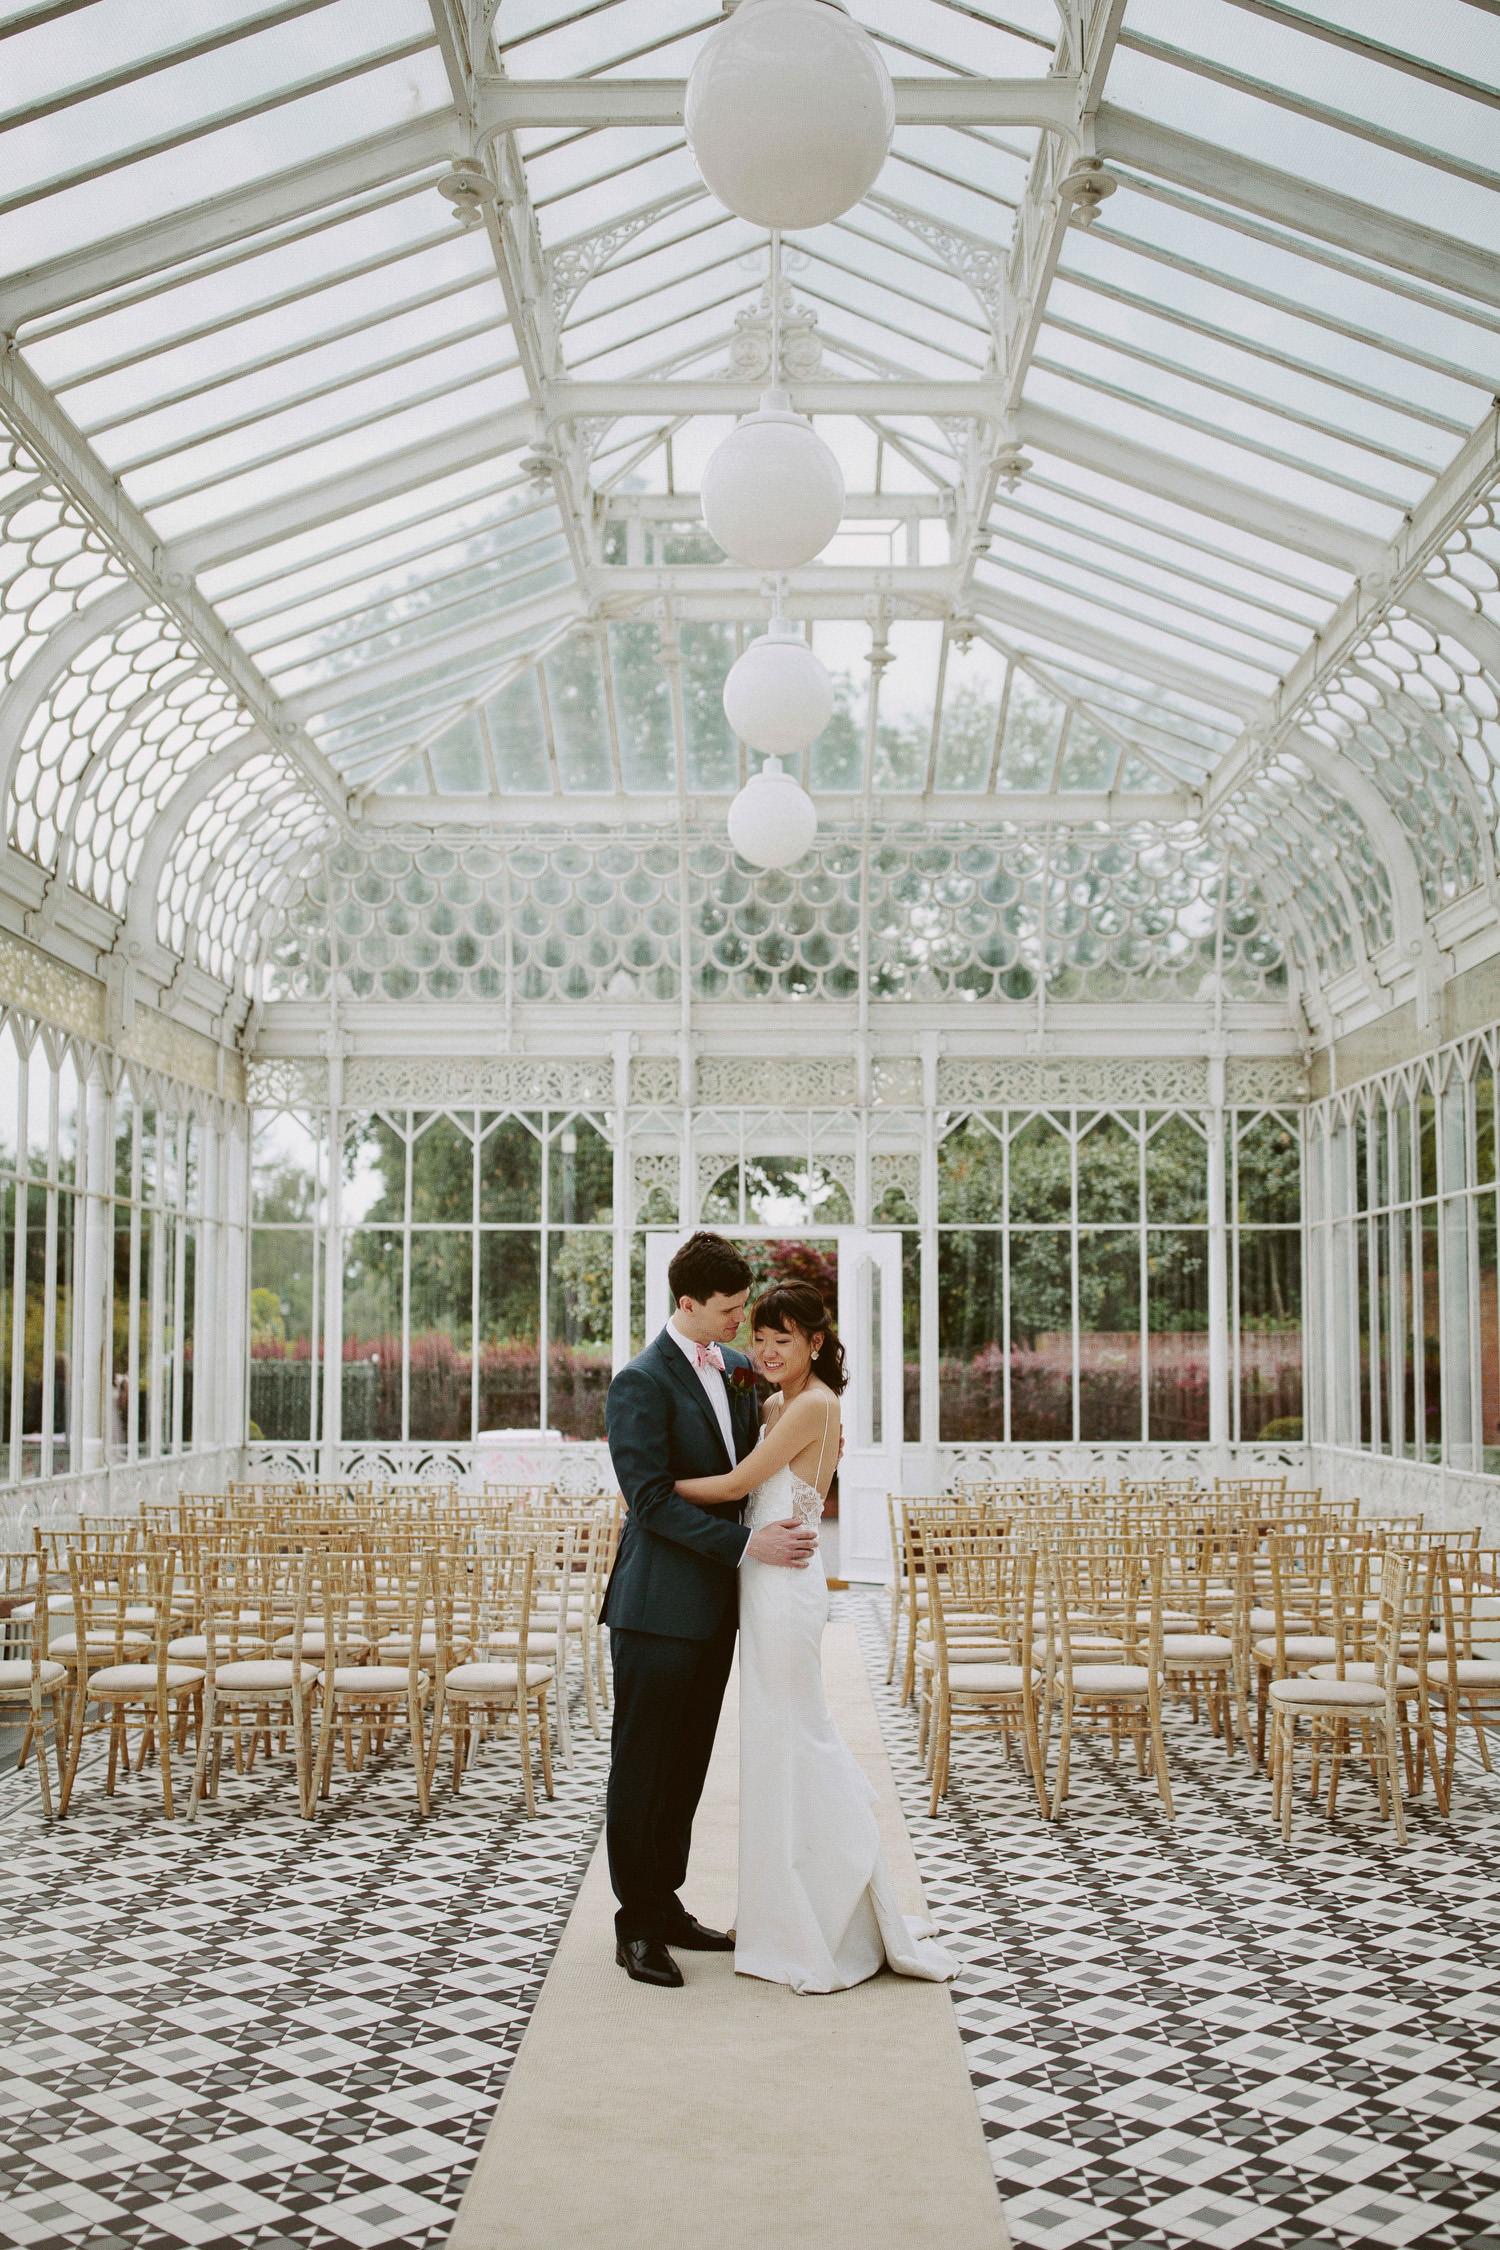 Wedding couple at Horniman museum London